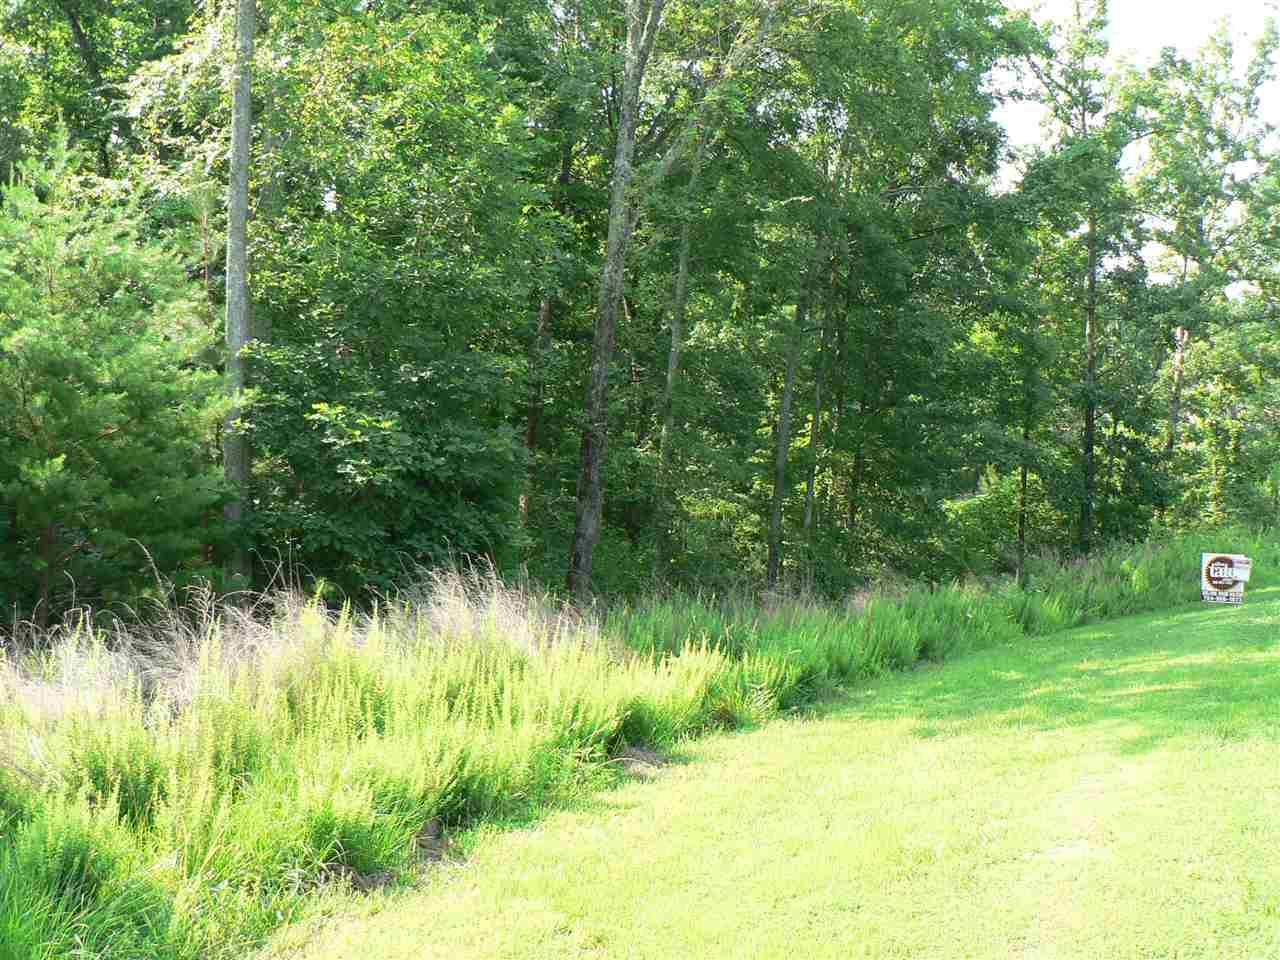 Real Estate for Sale, ListingId: 32581552, Lake Wylie,SC29710